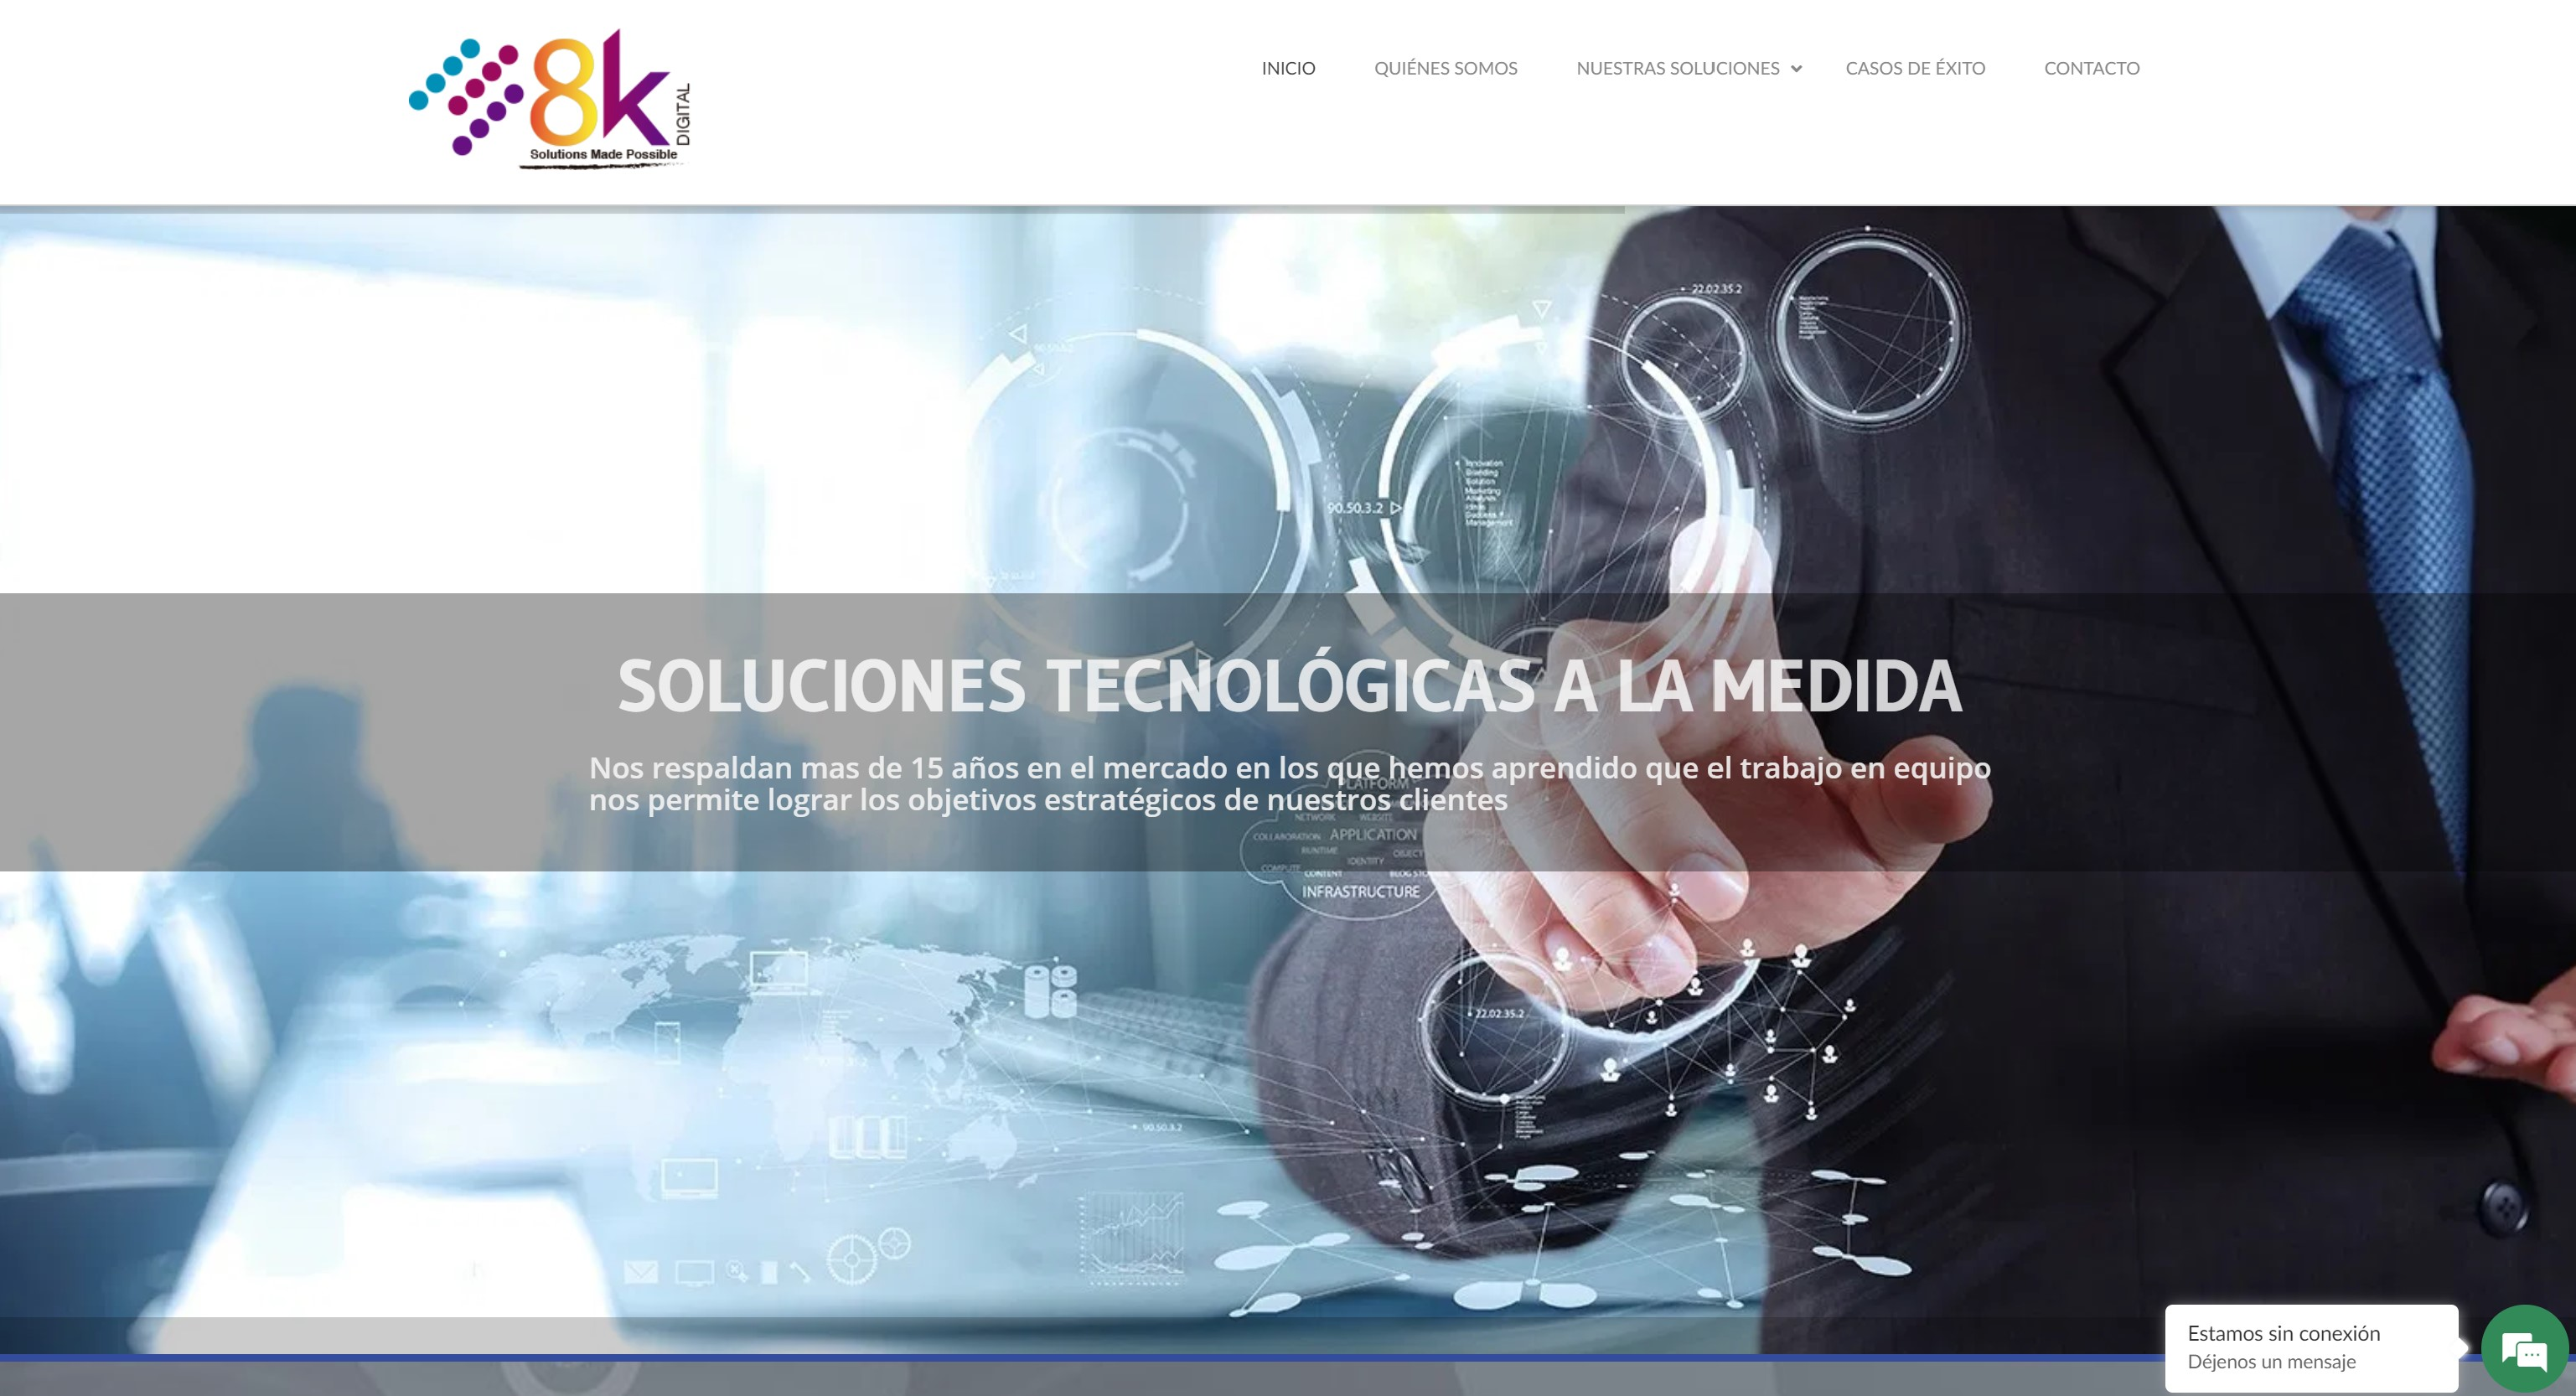 Sitio web 8K Digital